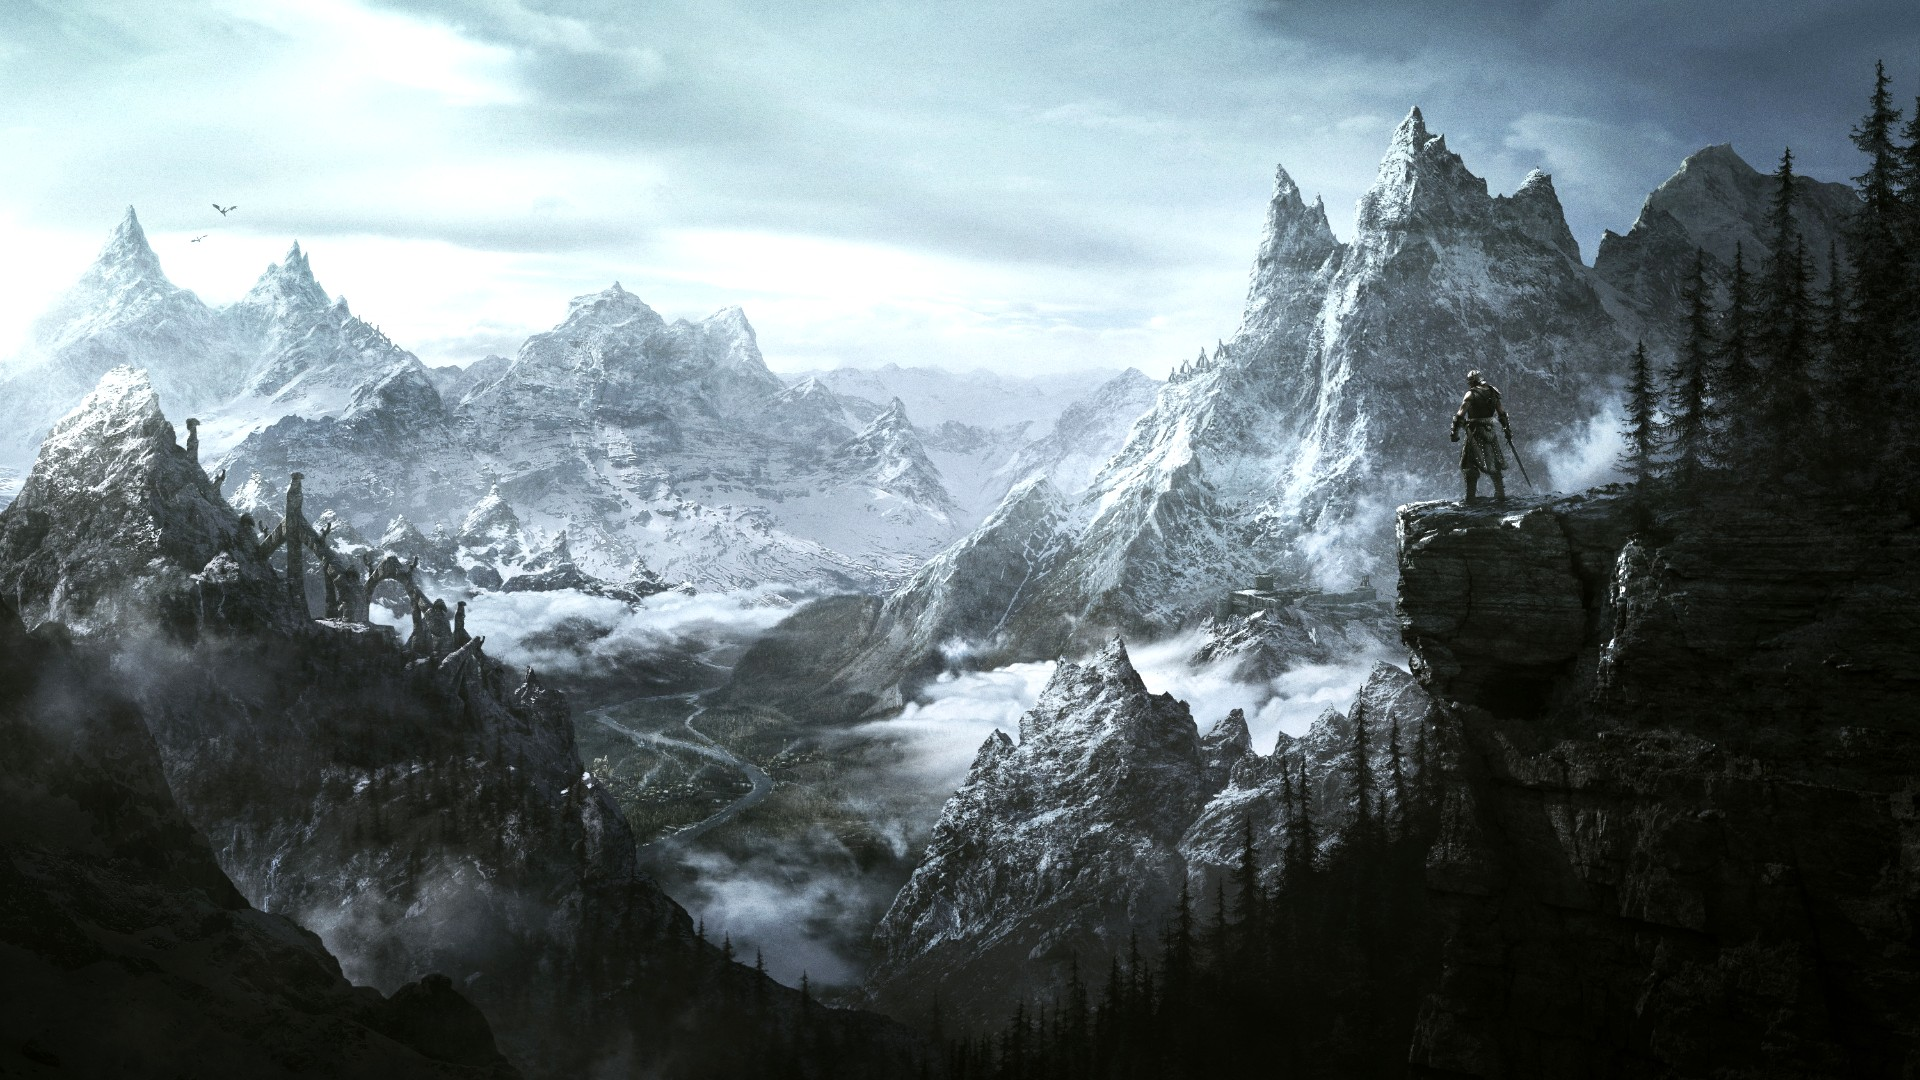 Valheim player recreates Skyrim's High Hrothgar in all its Greybeardy glory